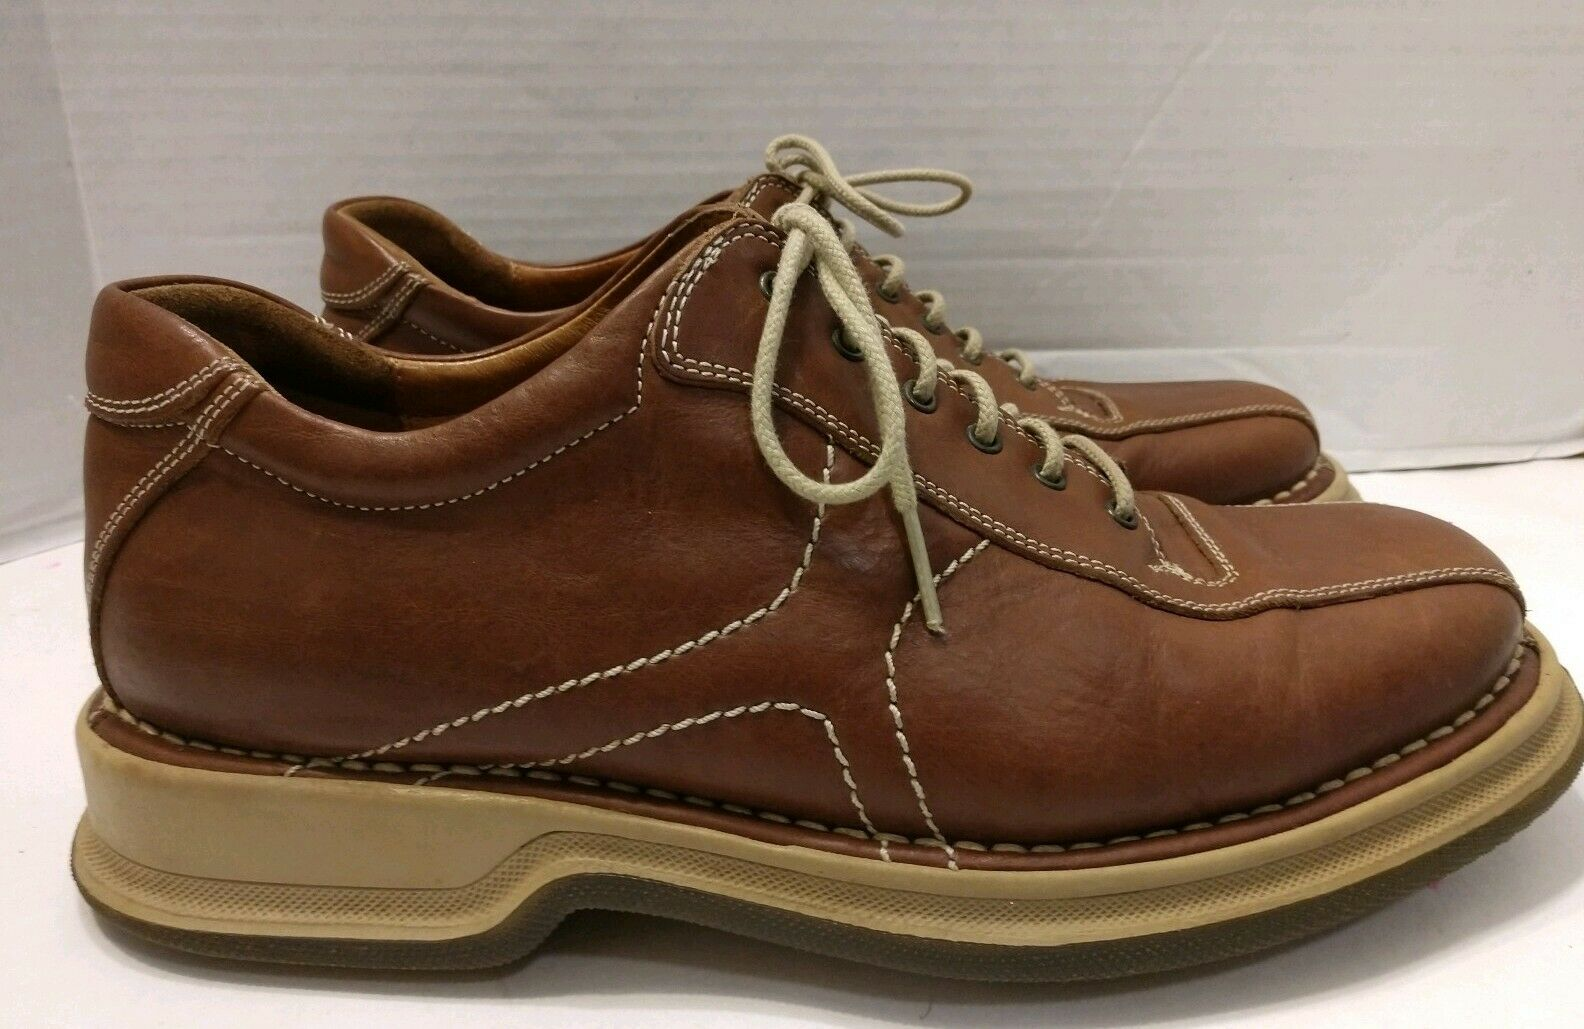 Johnston & Murphy Mens Sz 9 braun Leather Oxfords schuhe Handmade  20-0808